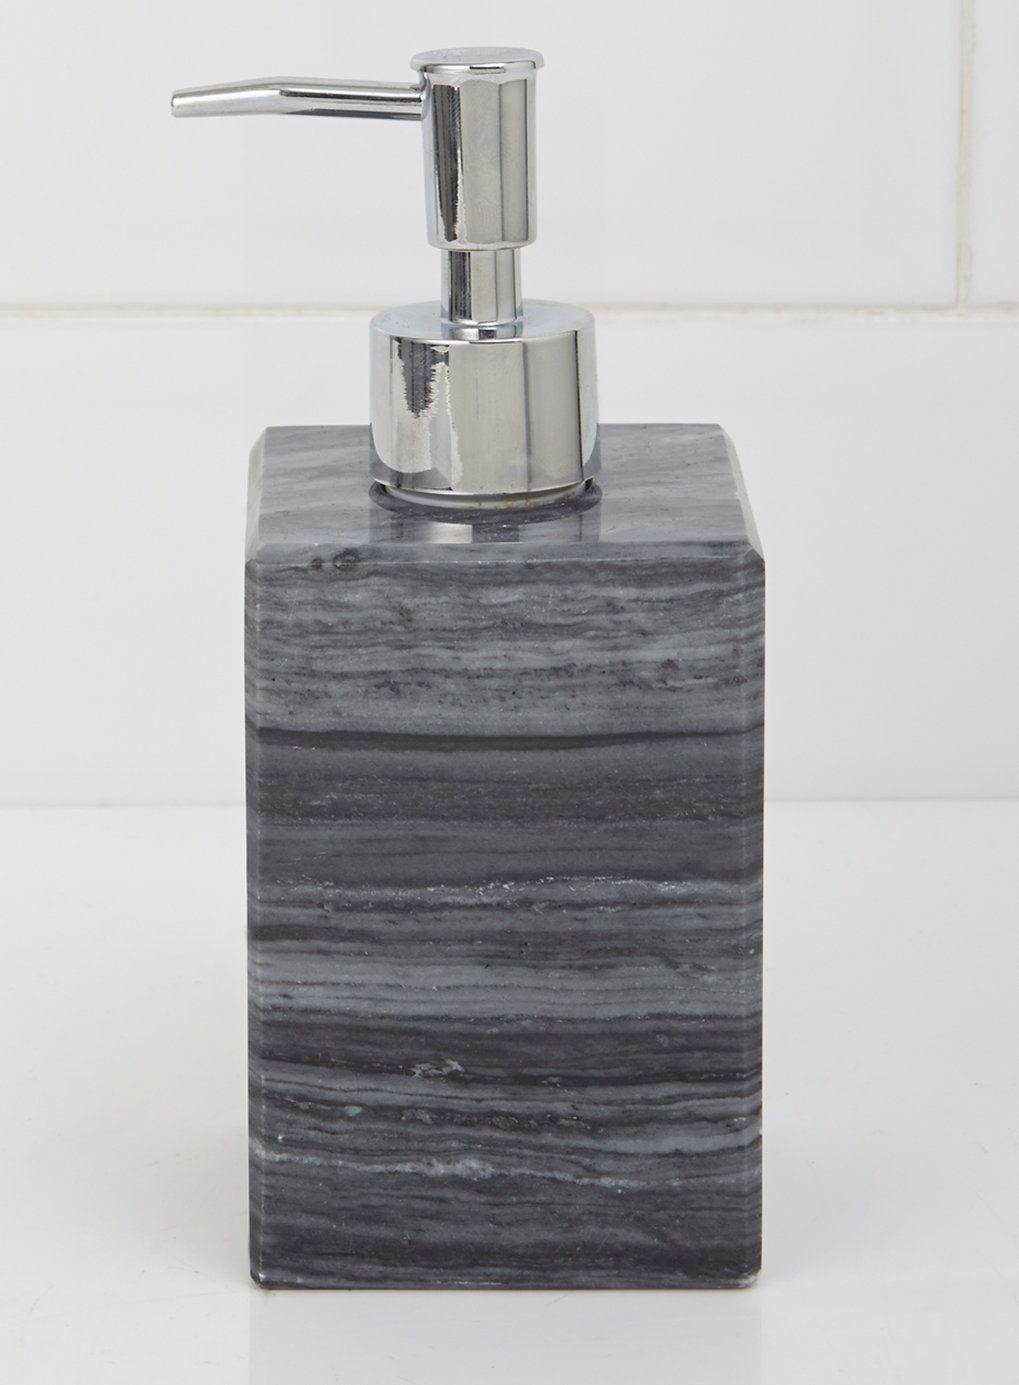 Grey marble soap dispenser bhs bathroom accessories - Bathroom accessories soap dispenser ...